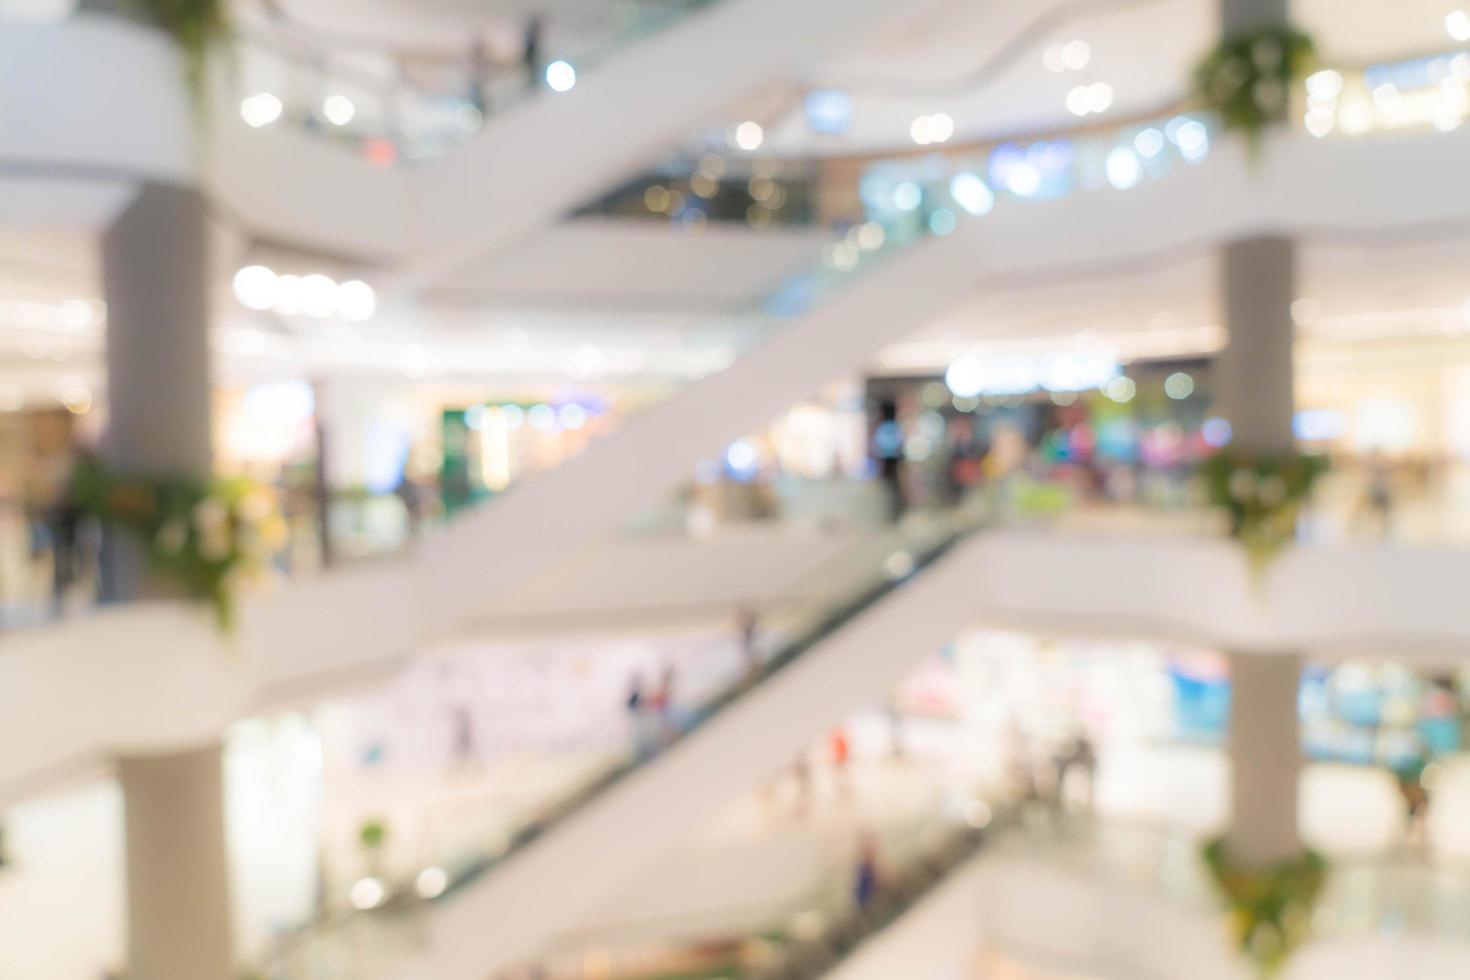 desenfoque abstracto hermoso centro comercial de lujo centro foto